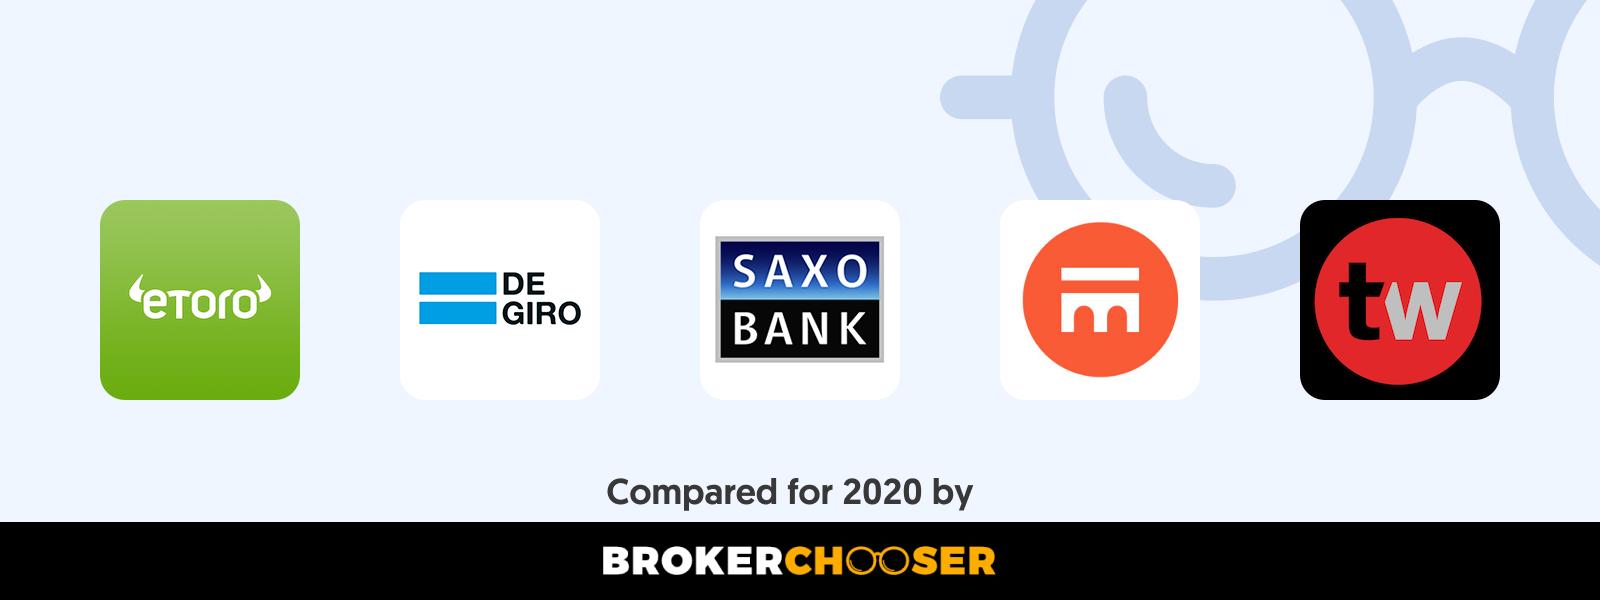 Best brokers for beginners in Greece in 2020